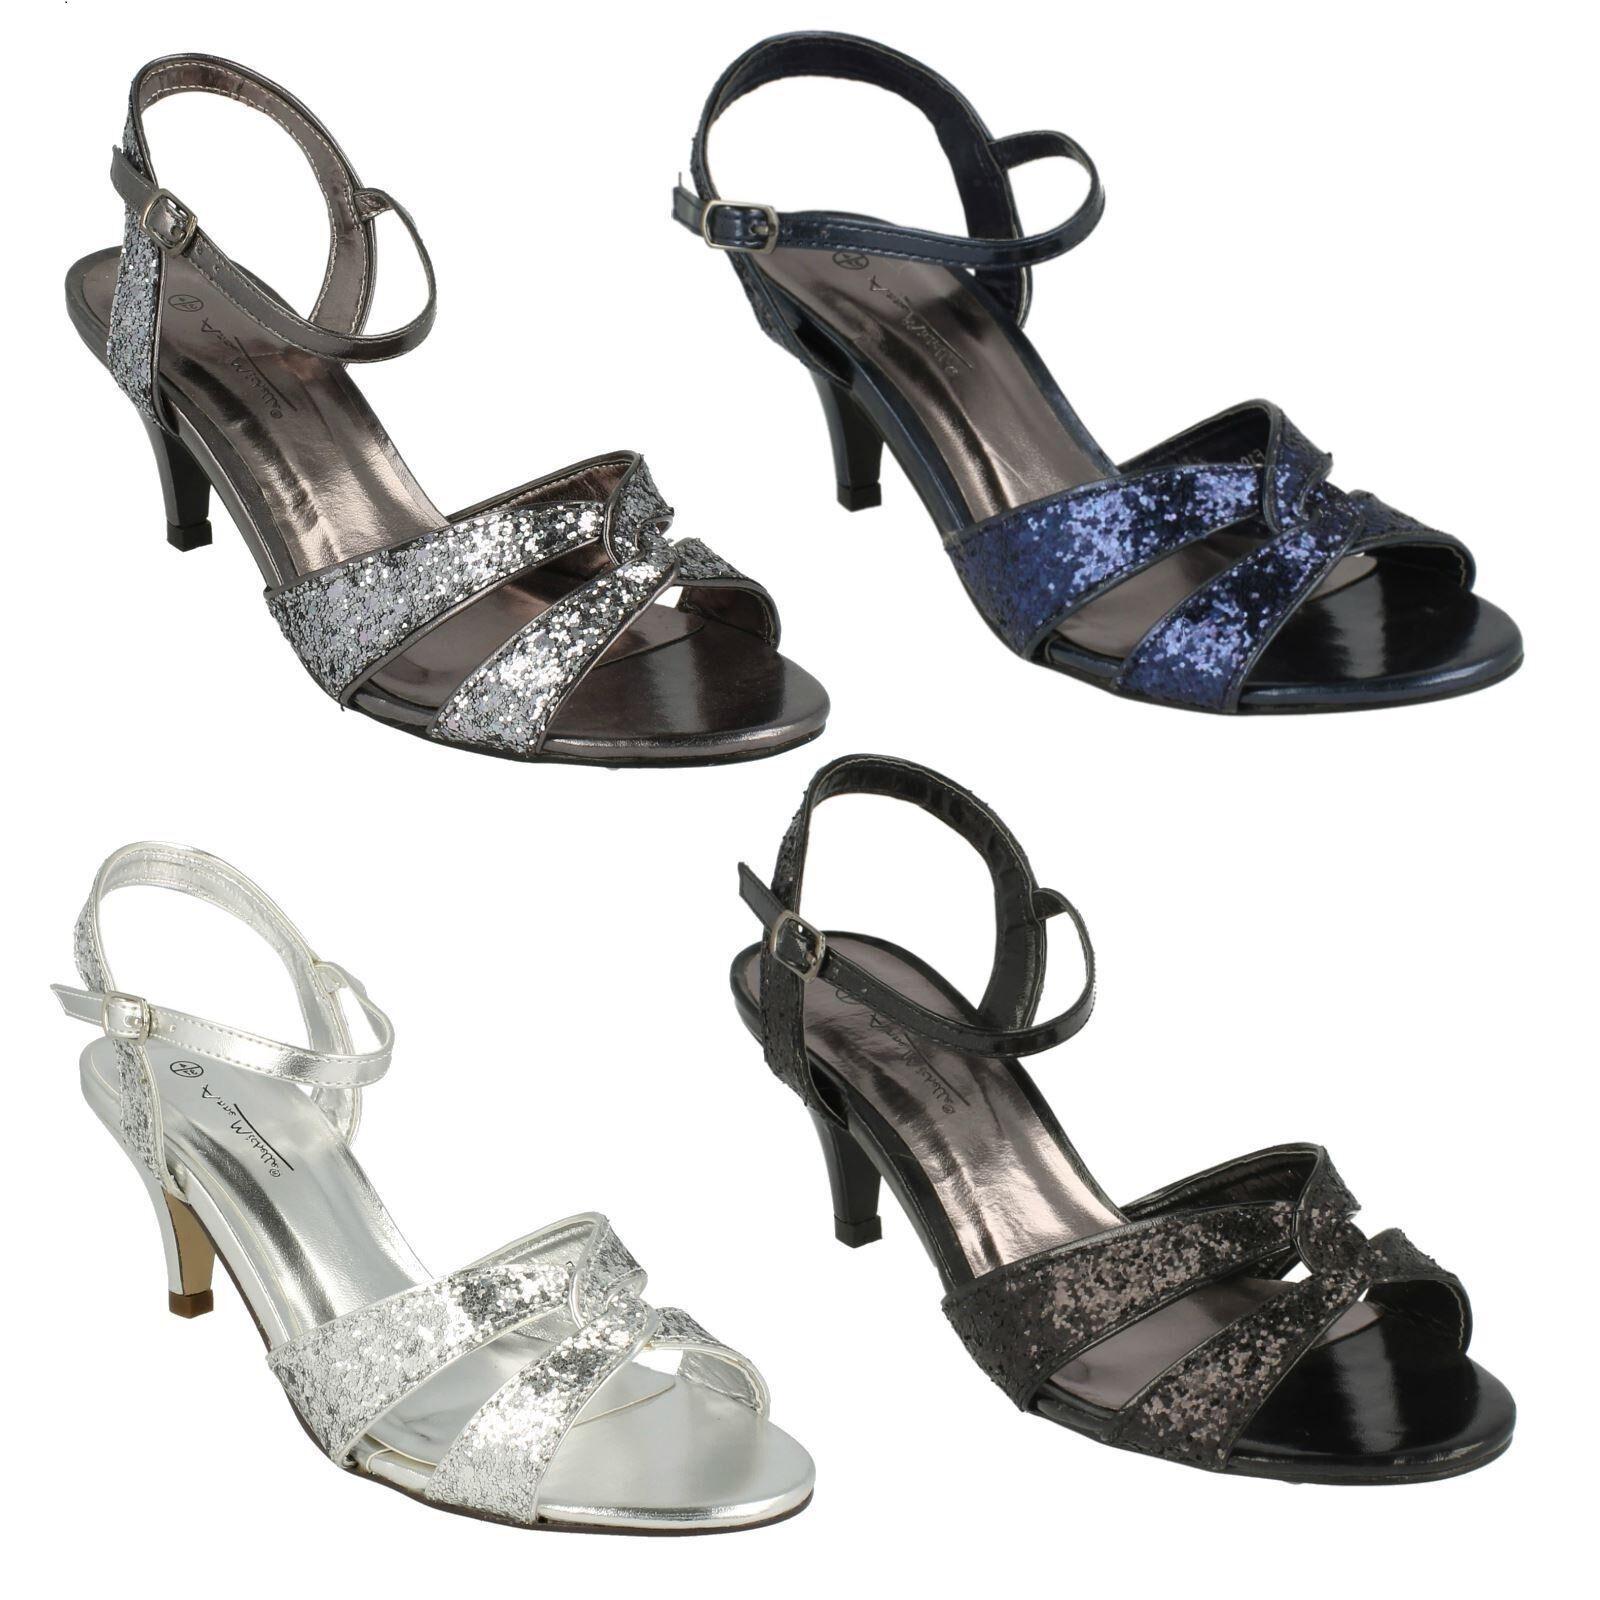 Nike Benassi JDI Badelatschen Sandale Badeschuhe Slipper black white 343880-090